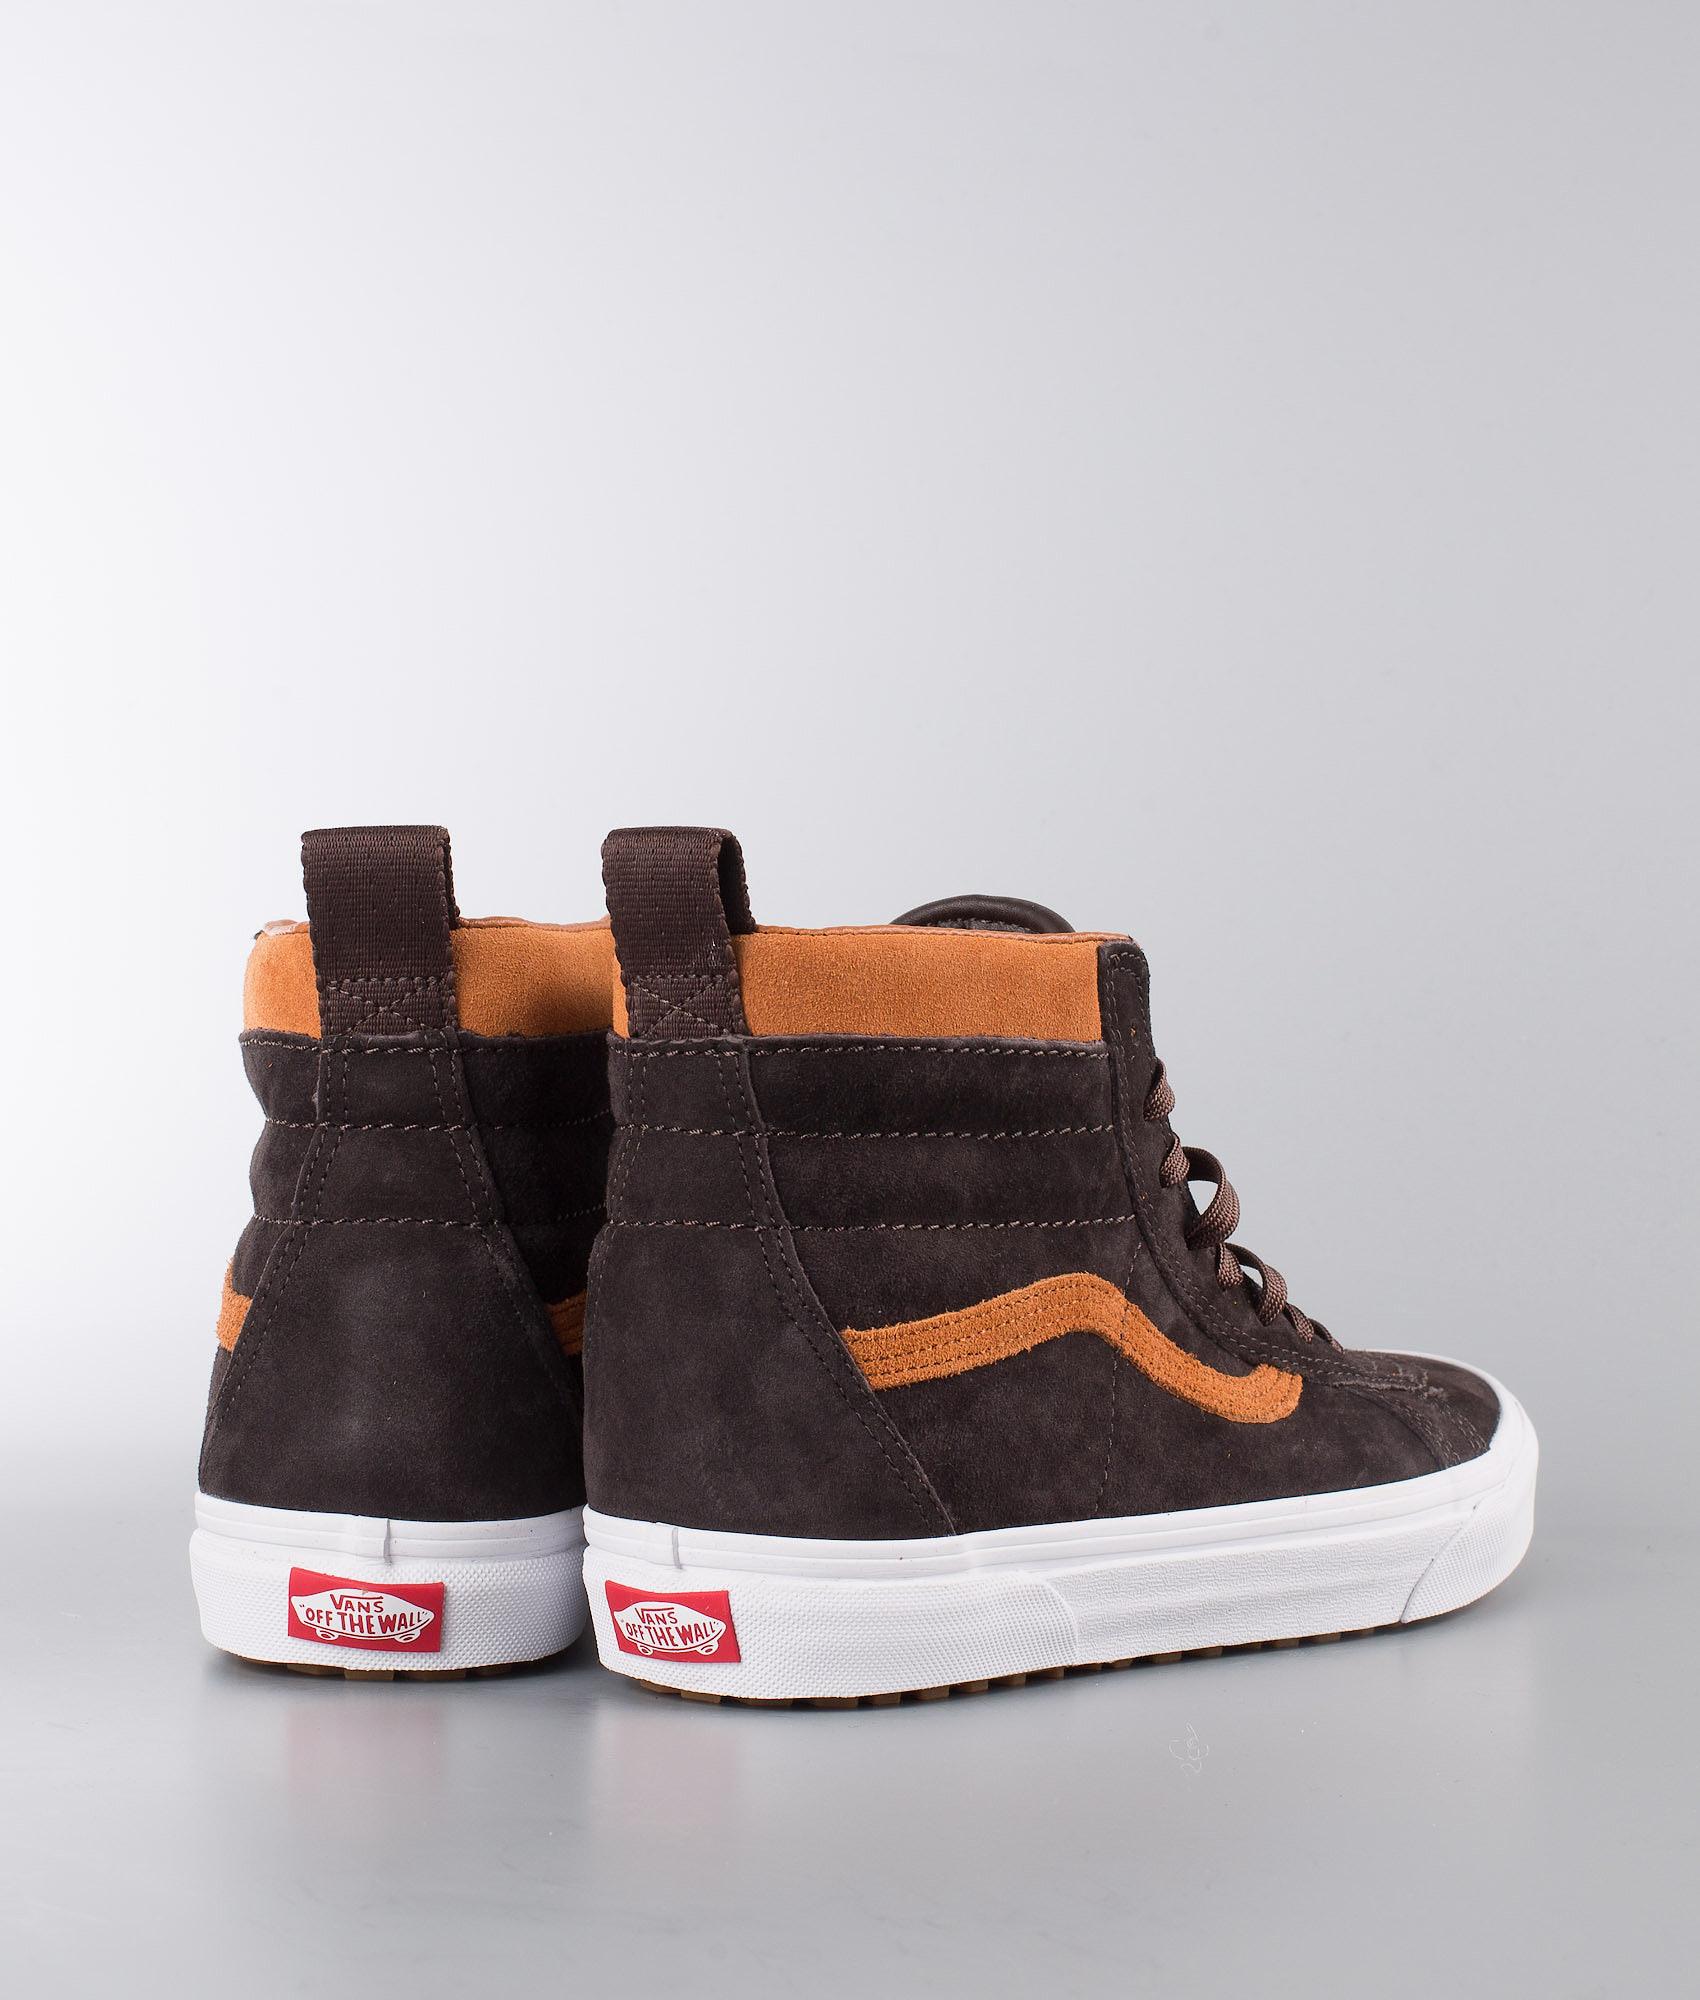 c5f013dc3f7ac Vans Sk8-Hi Mte Shoes (Mte) Suede/Chocolate Torte